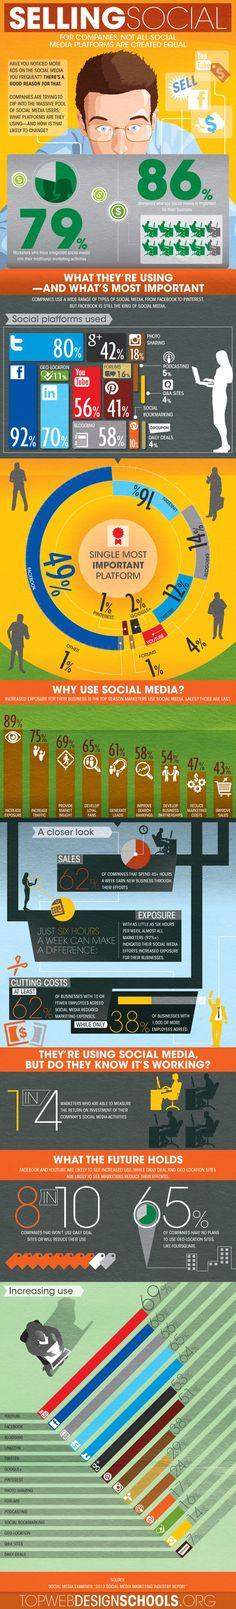 Social Media [INFOGRAPHIC] #socialmedia #infographic